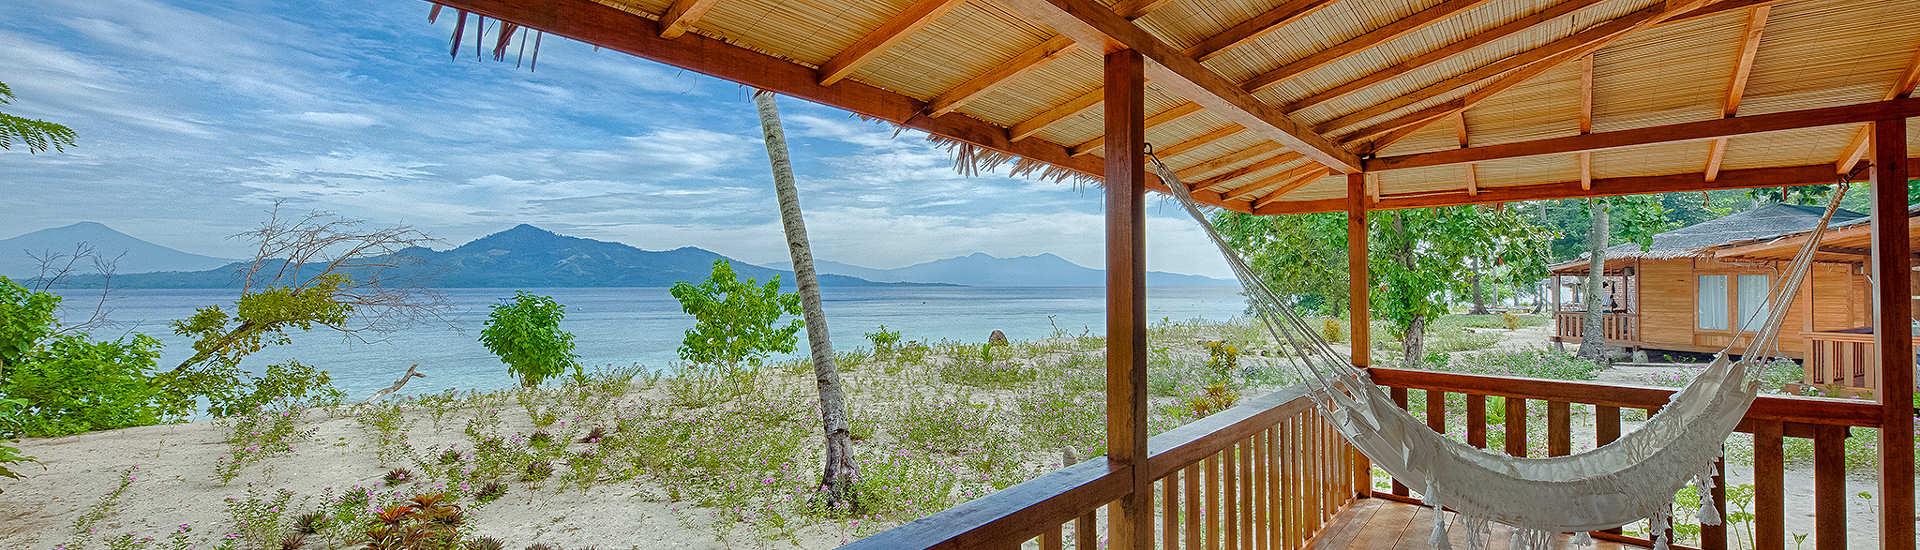 Kuda Laut Boutique Dive Resort – Nord Sulawesi